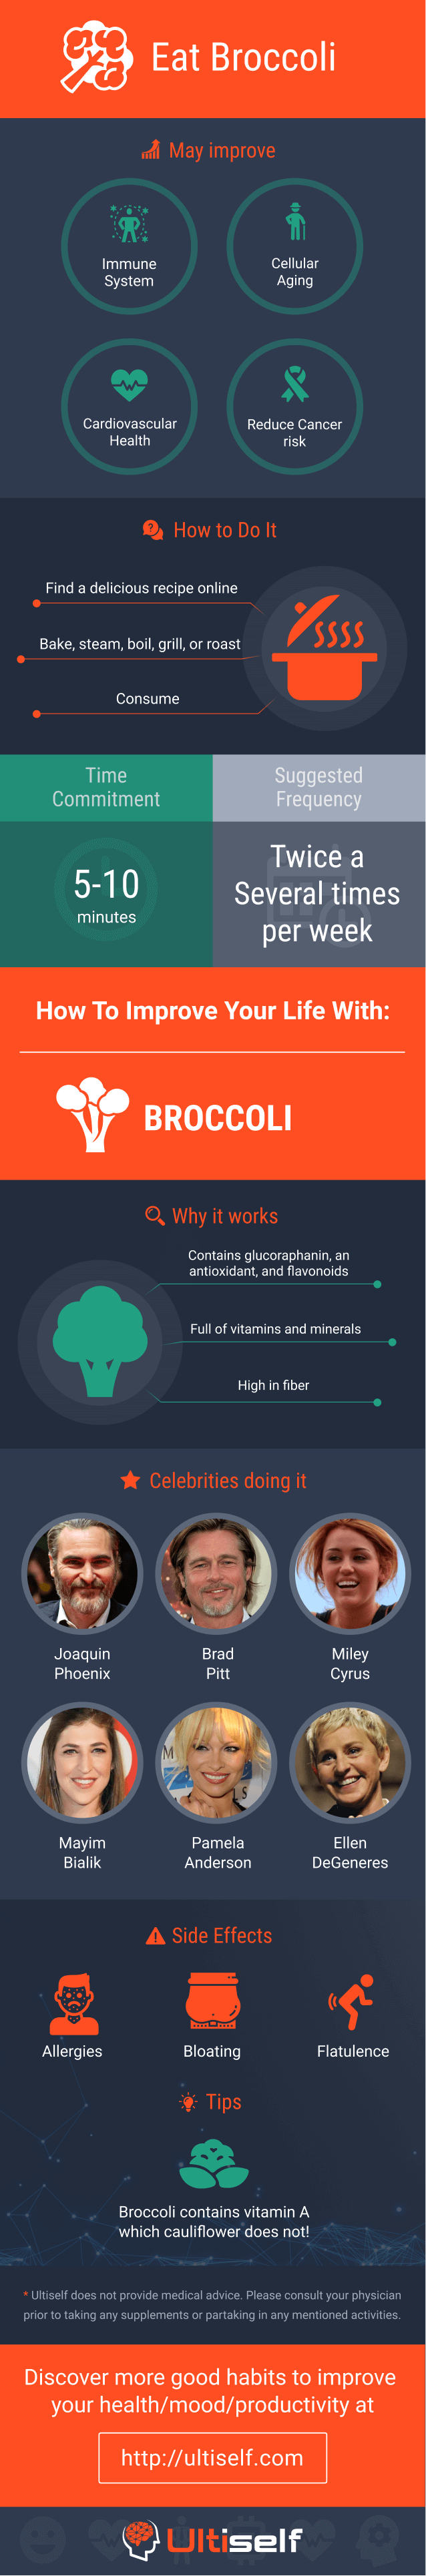 Eat Broccoli infographic